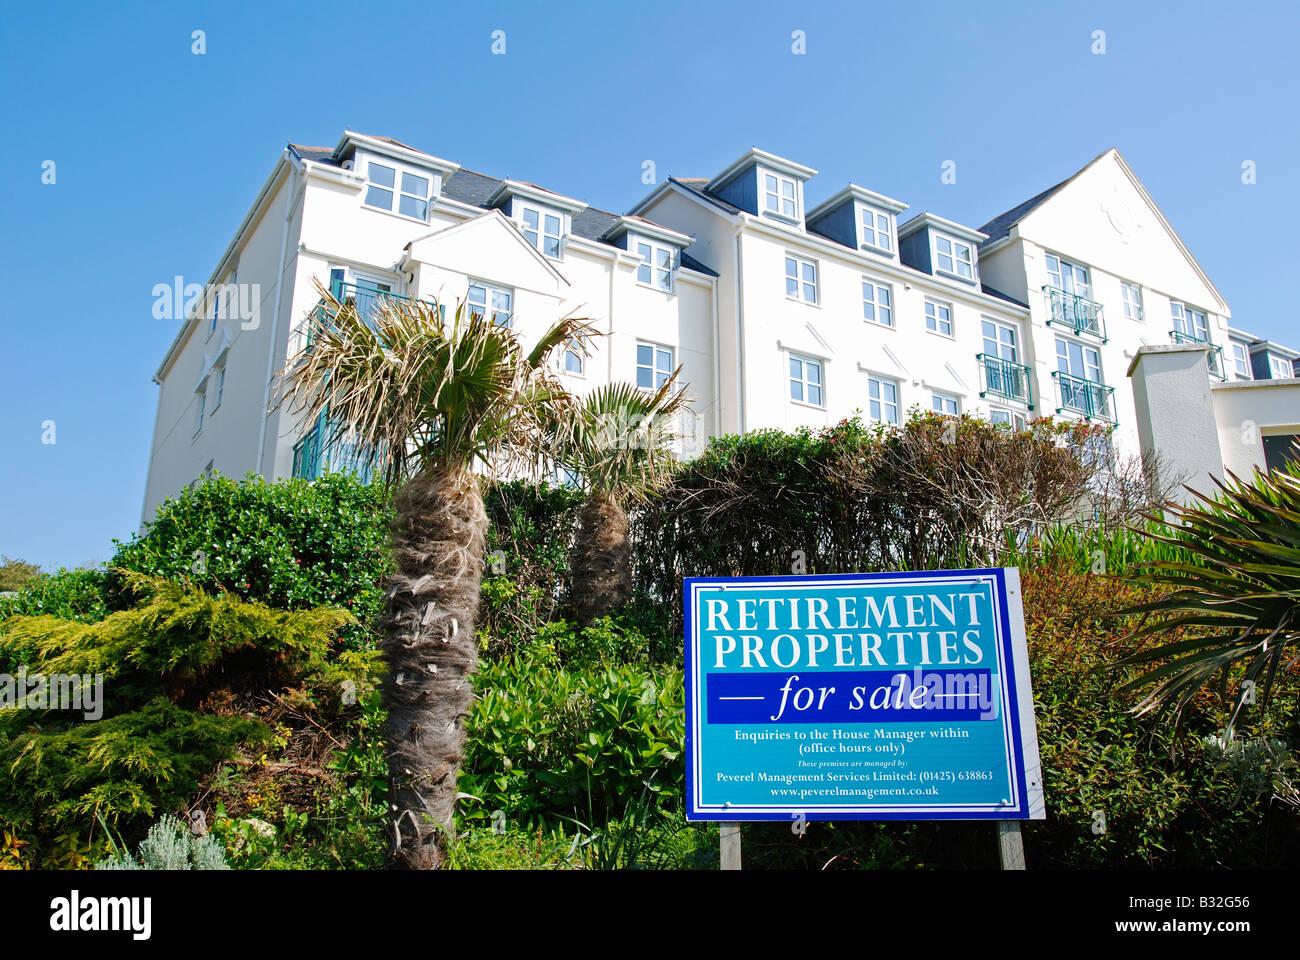 direkt am Meer Ruhestand Immobilien zum Verkauf in Falmouth in Cornwall, Großbritannien Stockbild